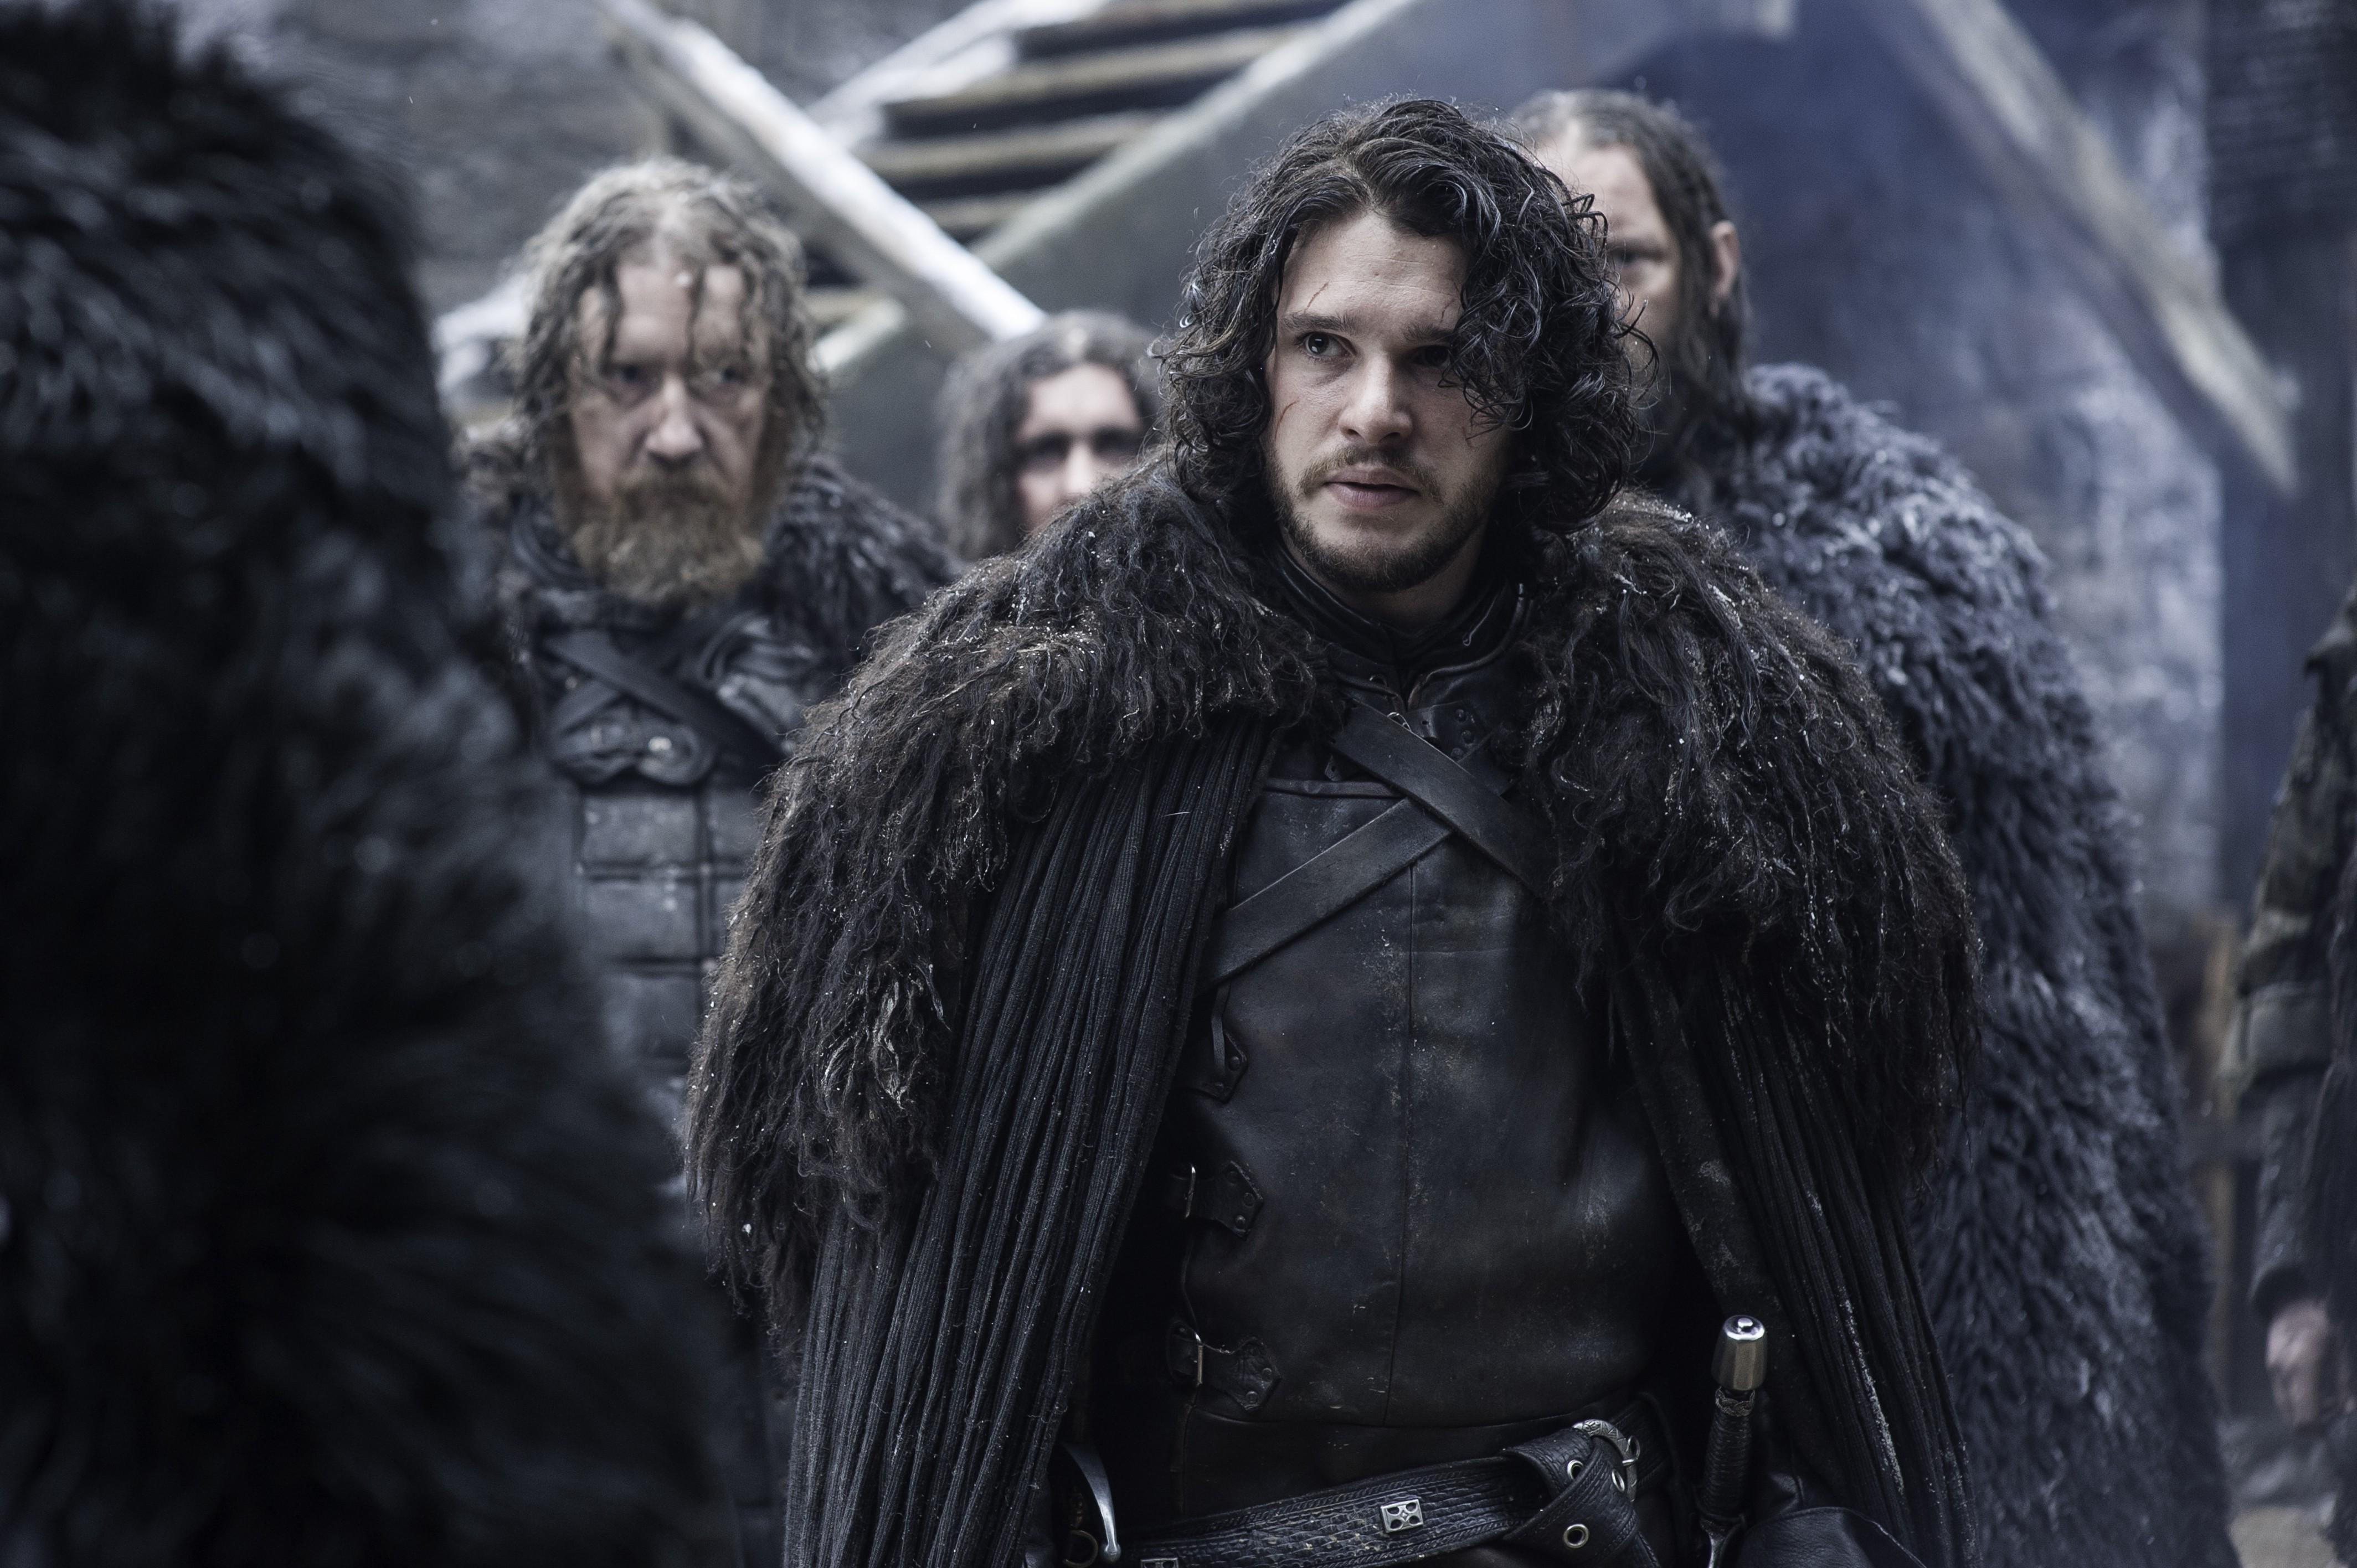 Wallpaper 4256x2832 Px Game Of Thrones Jon Snow Kit Harington